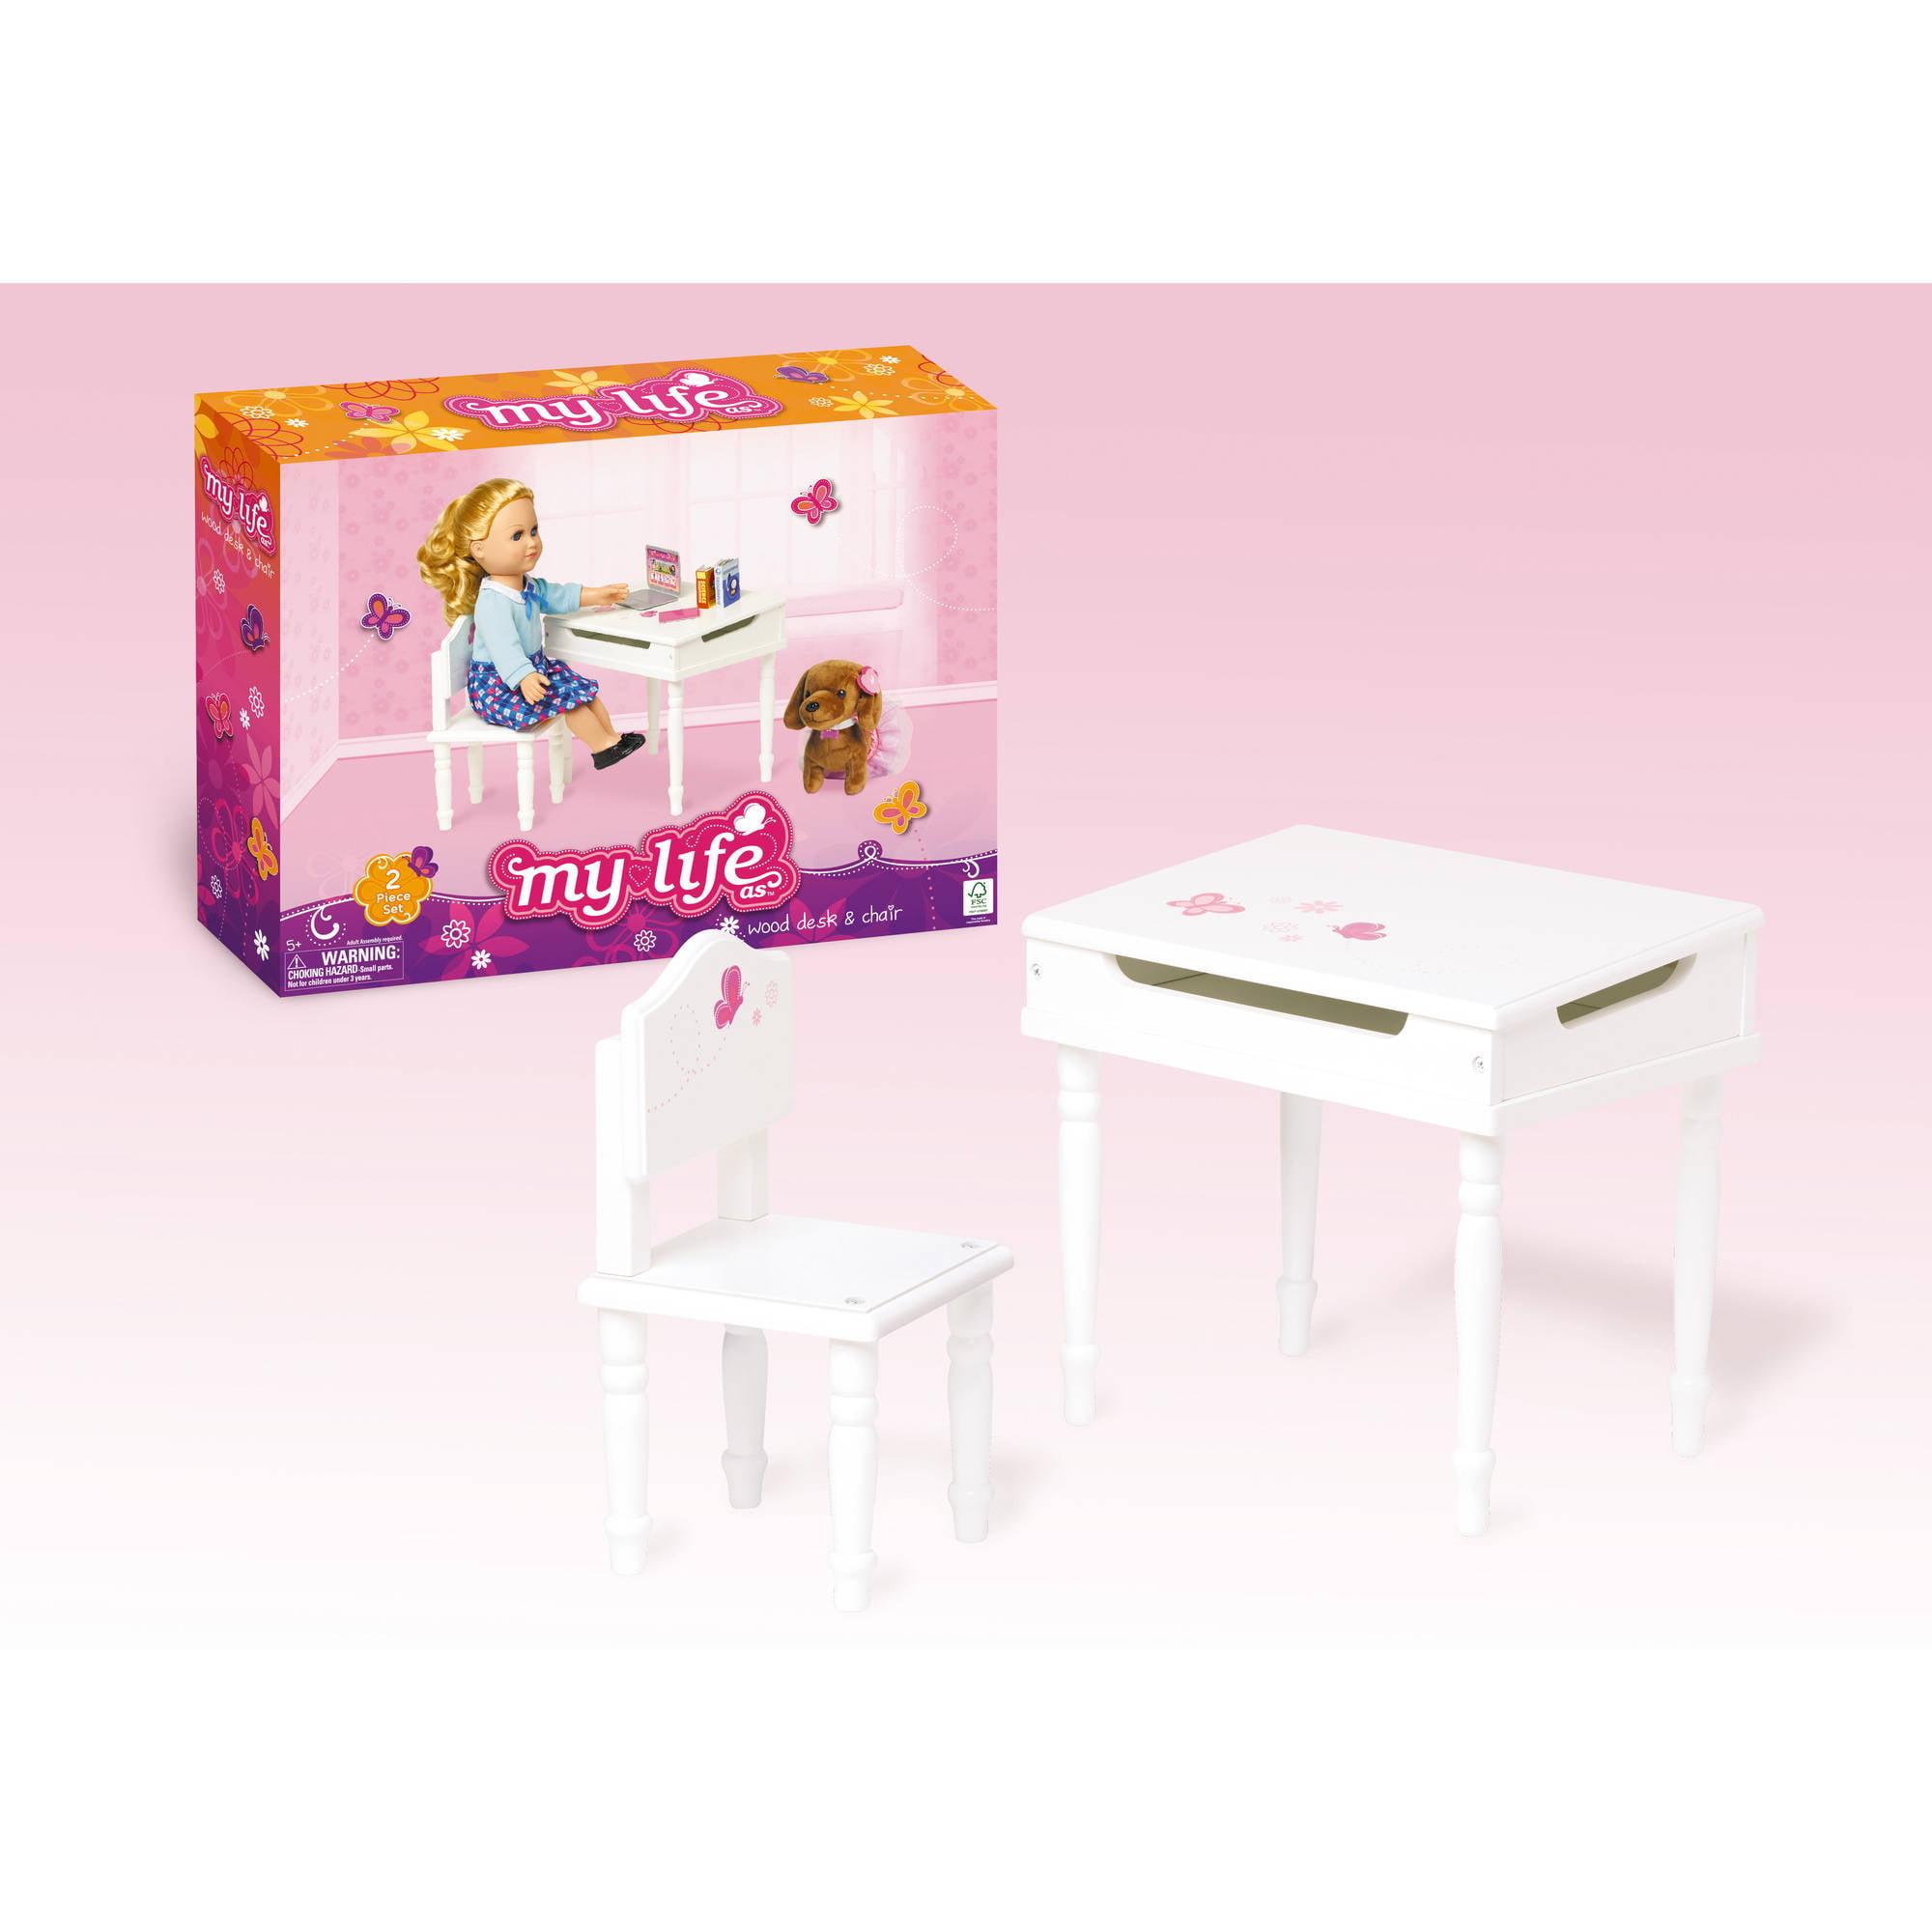 Astounding My Life As 18 Doll Furniture Desk And Chair Walmart Com Theyellowbook Wood Chair Design Ideas Theyellowbookinfo